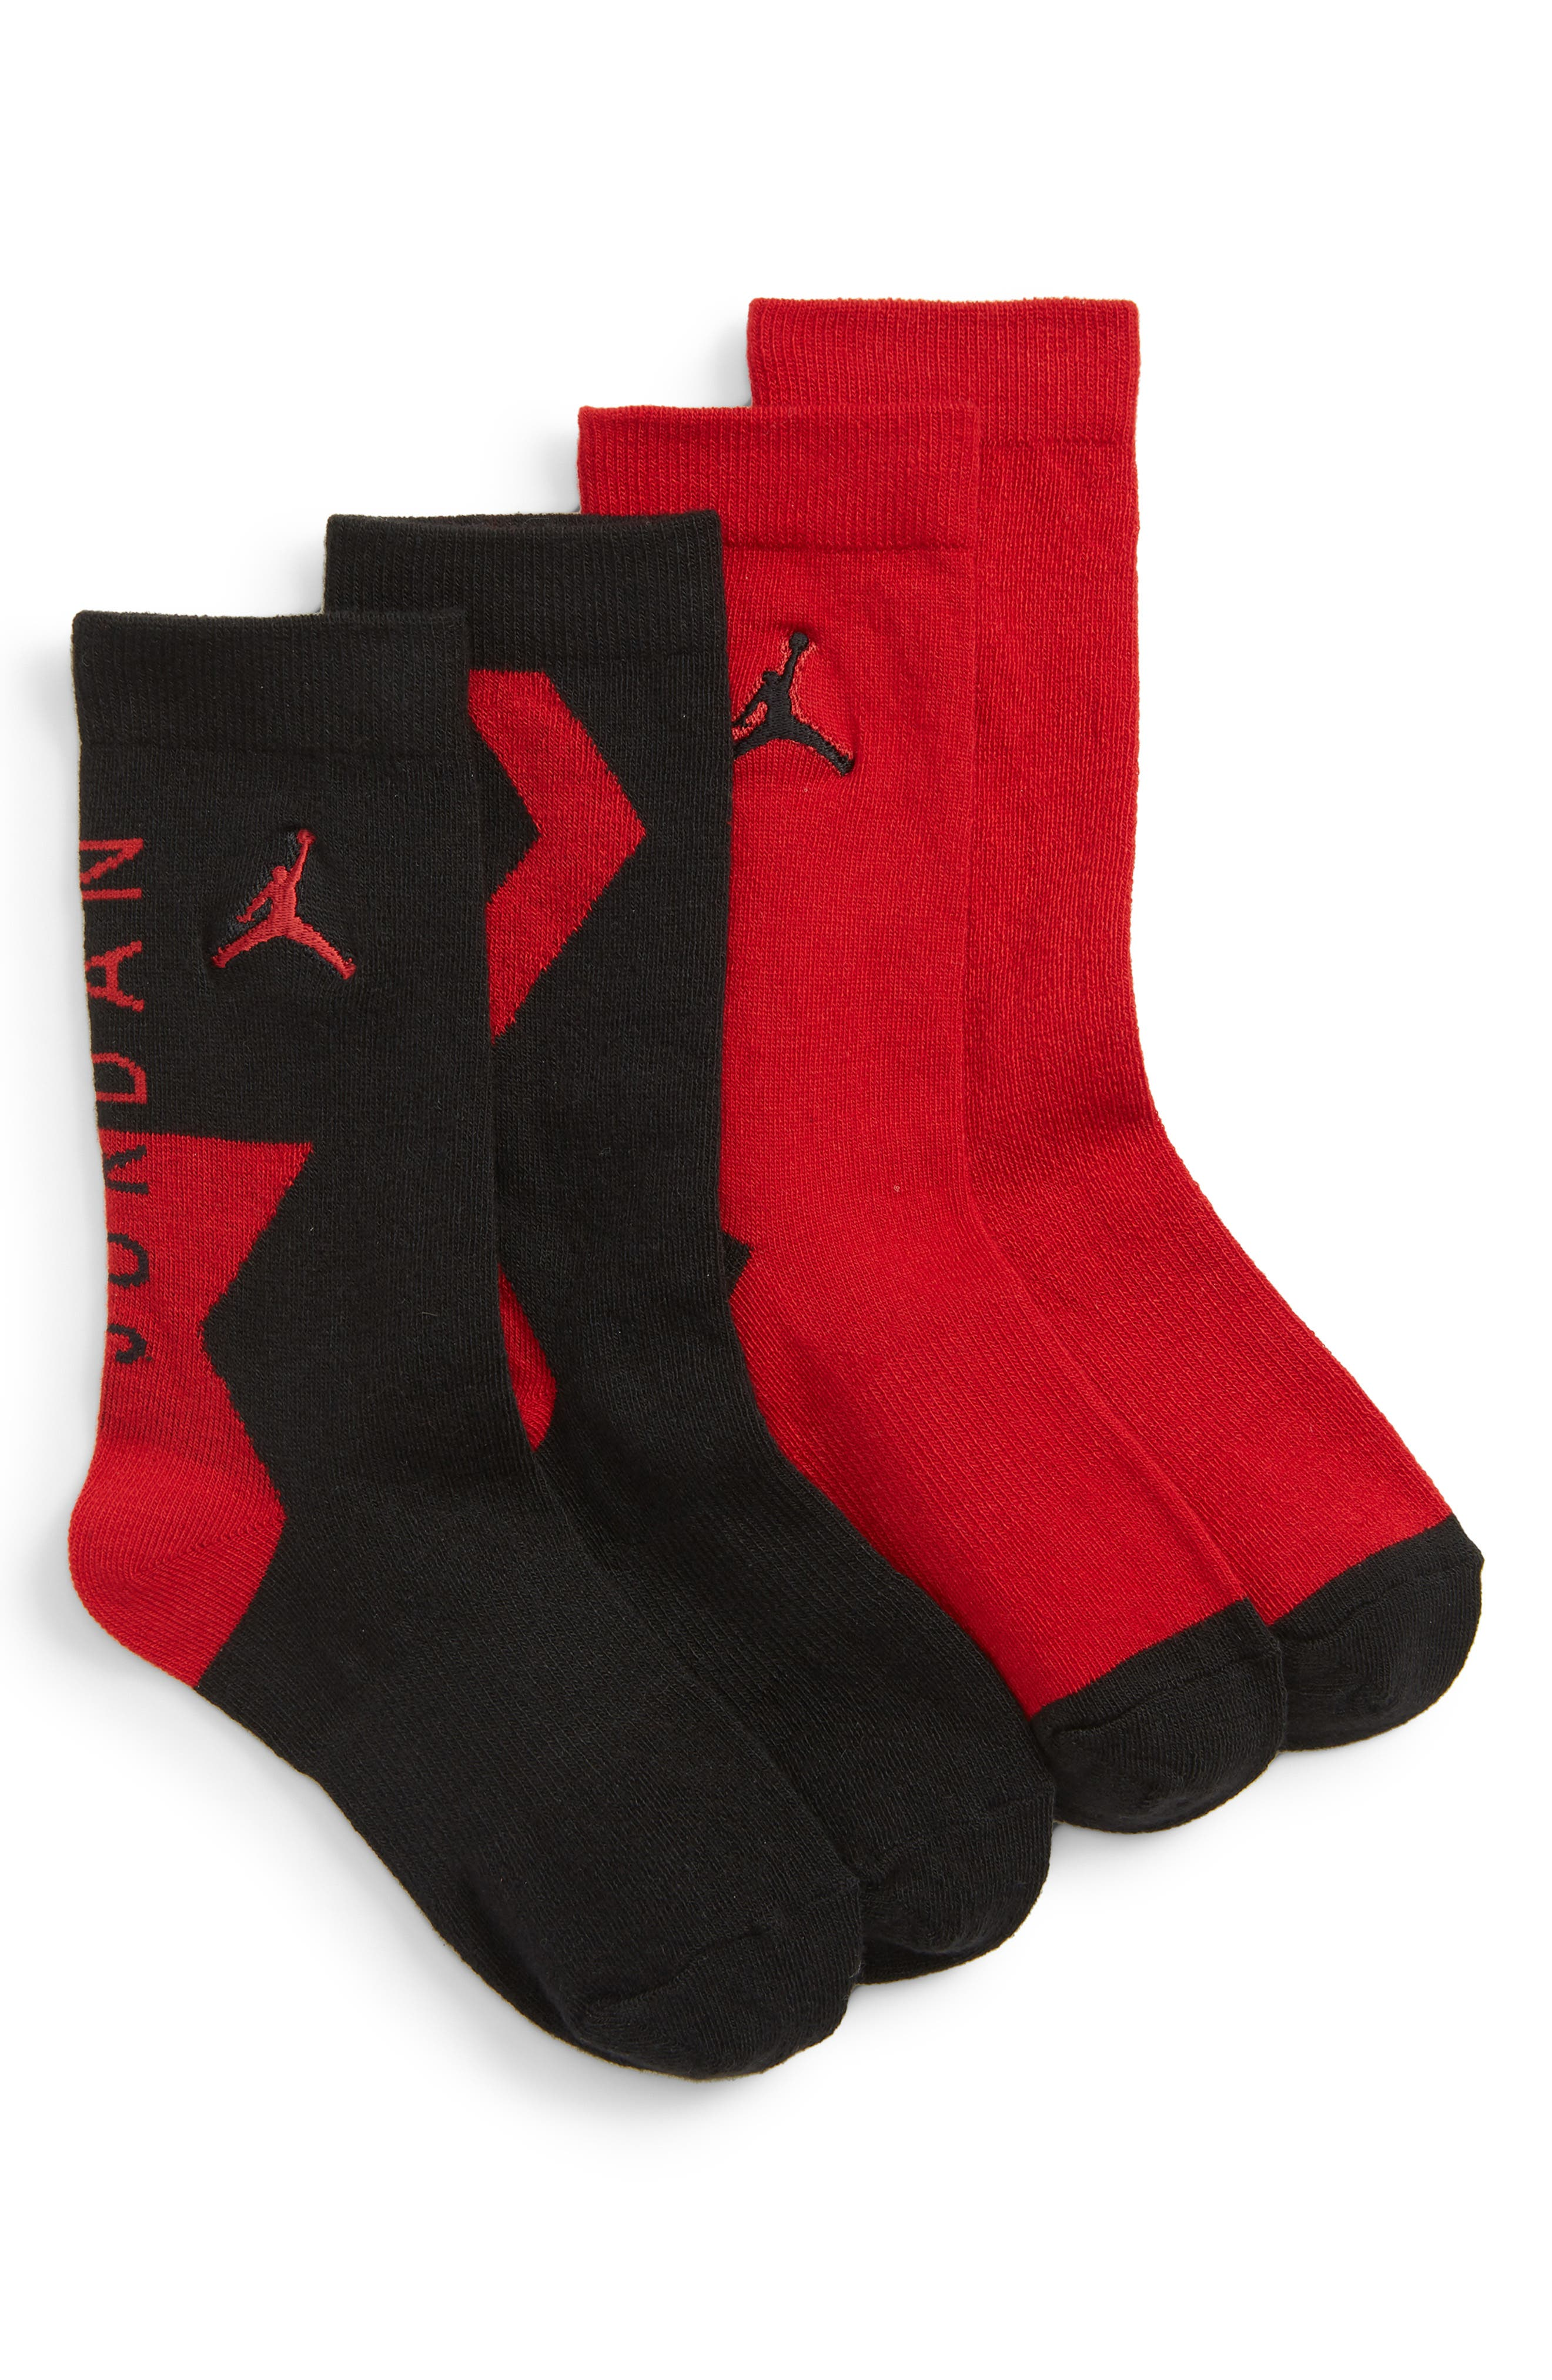 2-Pack Jordan Raise Up High Crew Socks,                             Main thumbnail 1, color,                             BLACK